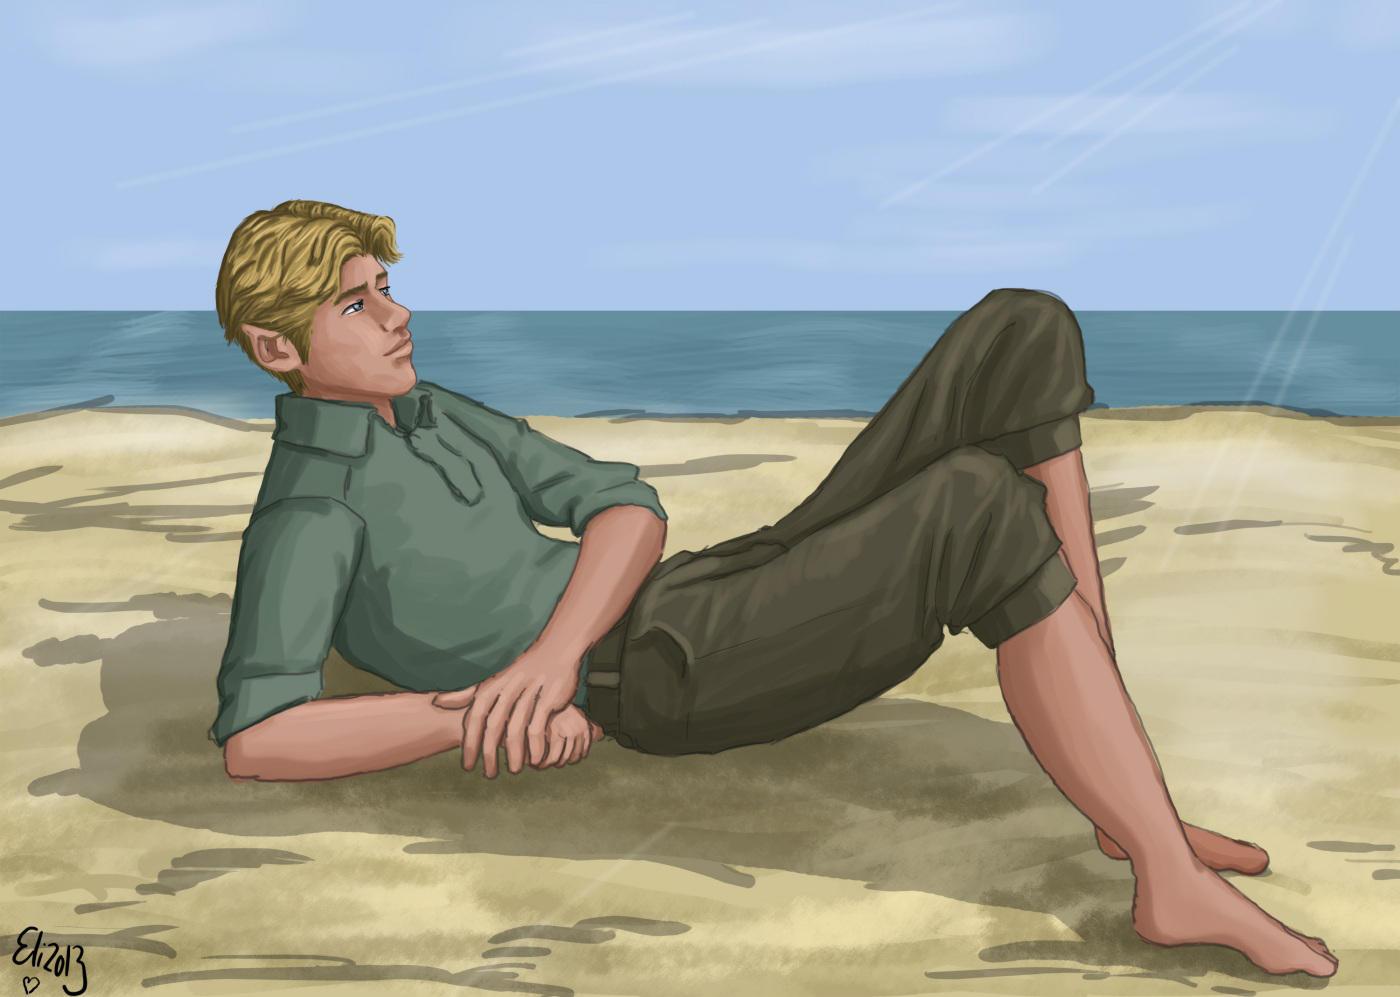 Gad at beach by Elikal